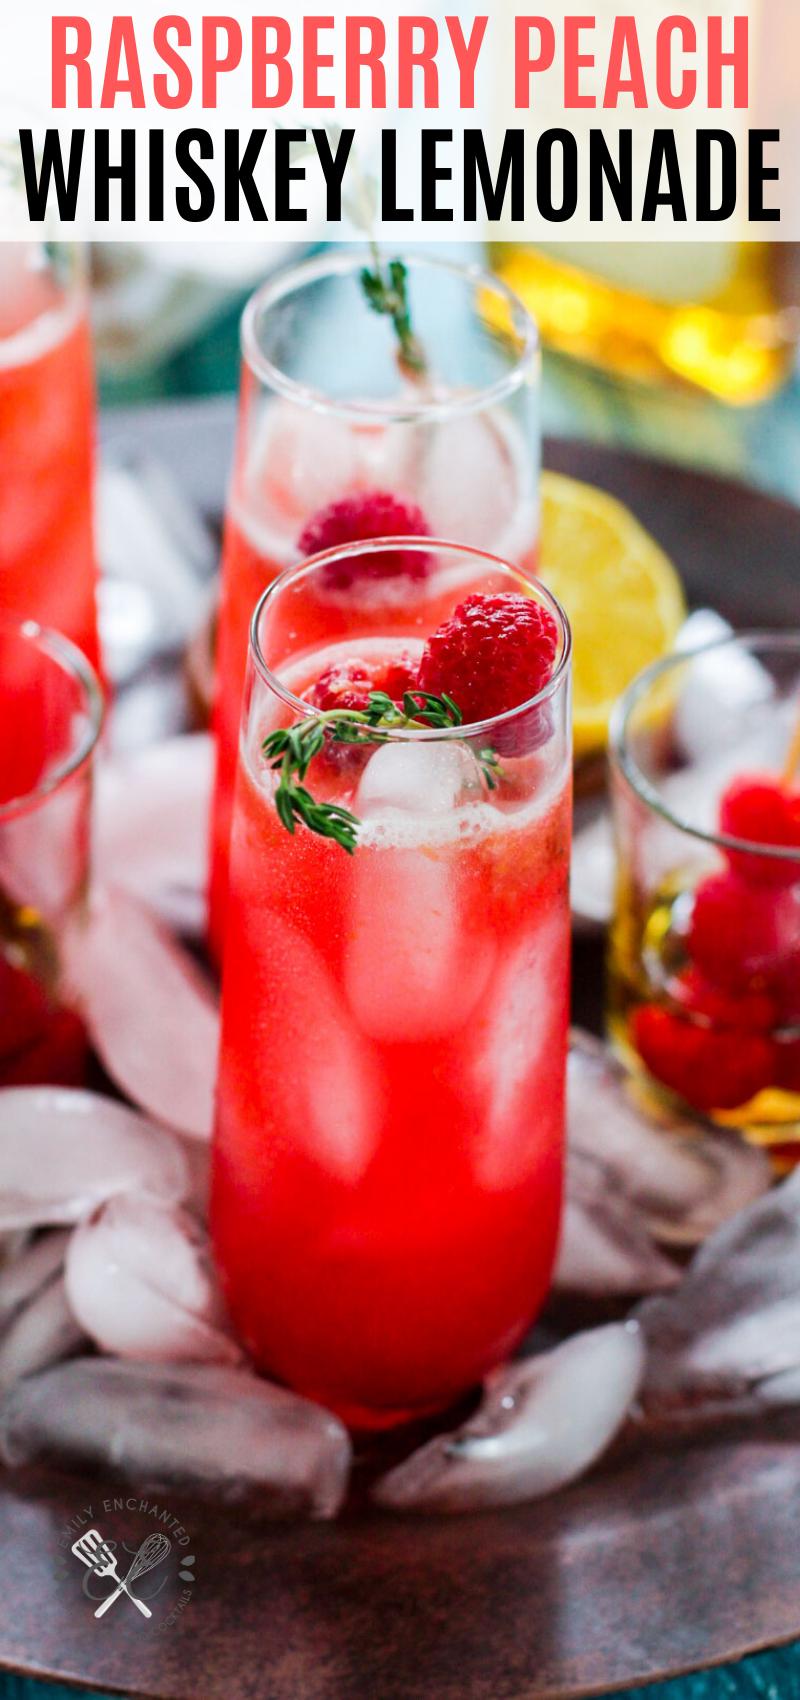 Photo of Raspberry Peach Whiskey Lemonade Cocktail